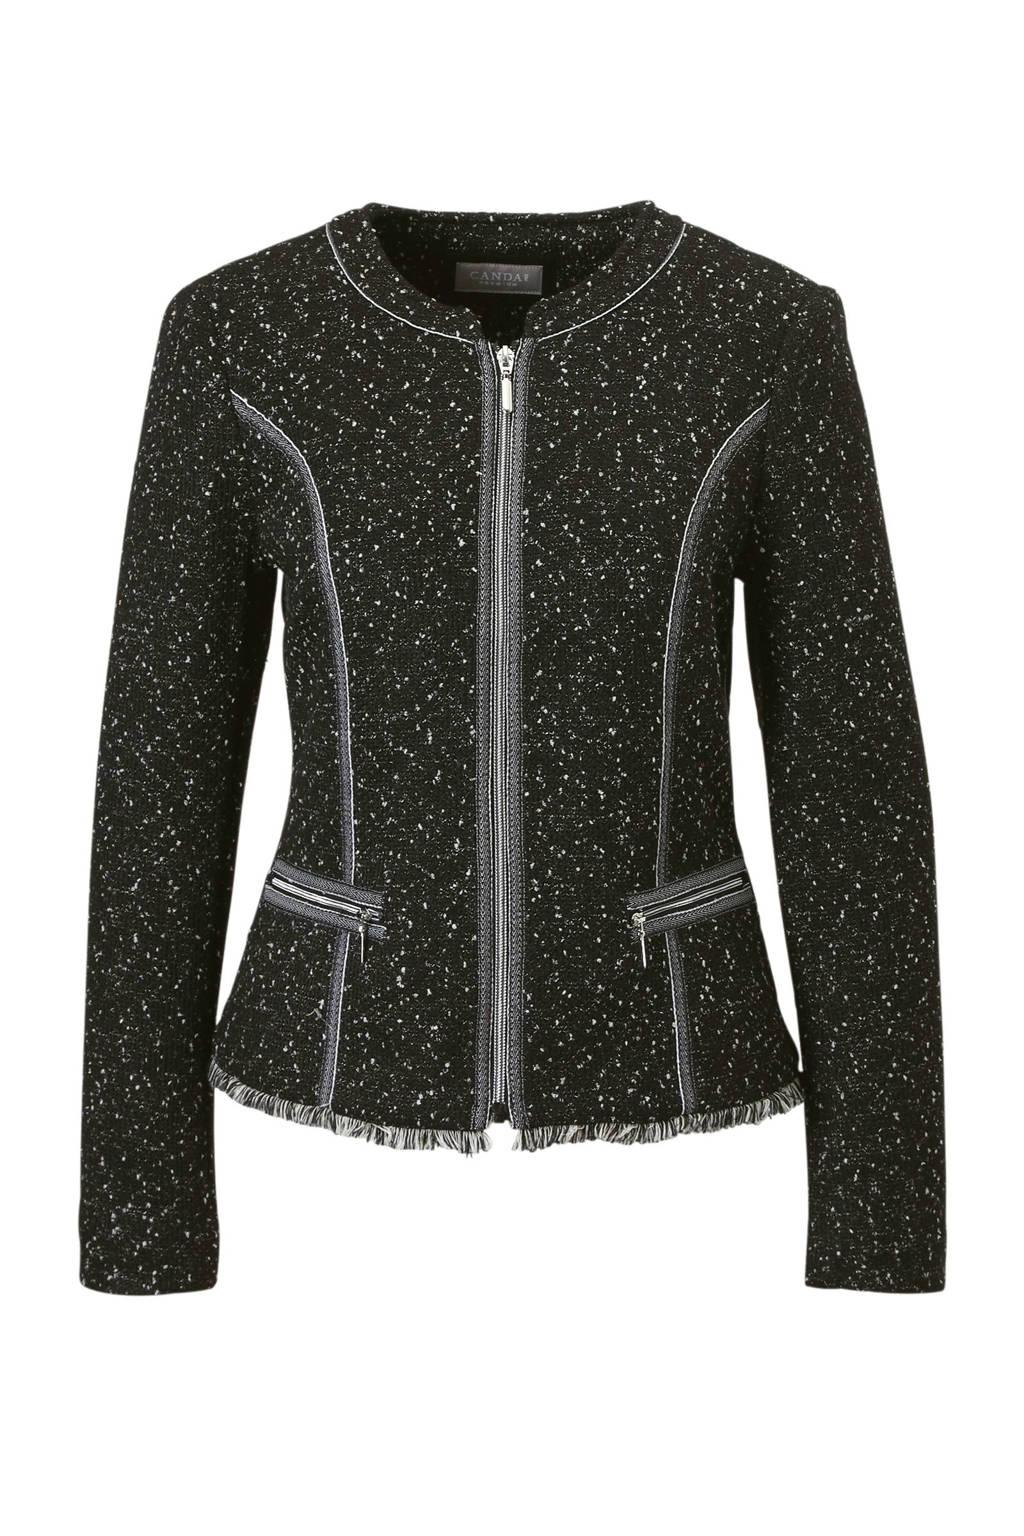 C&A Canda Canda blazer, black+whitepepperboucleknit